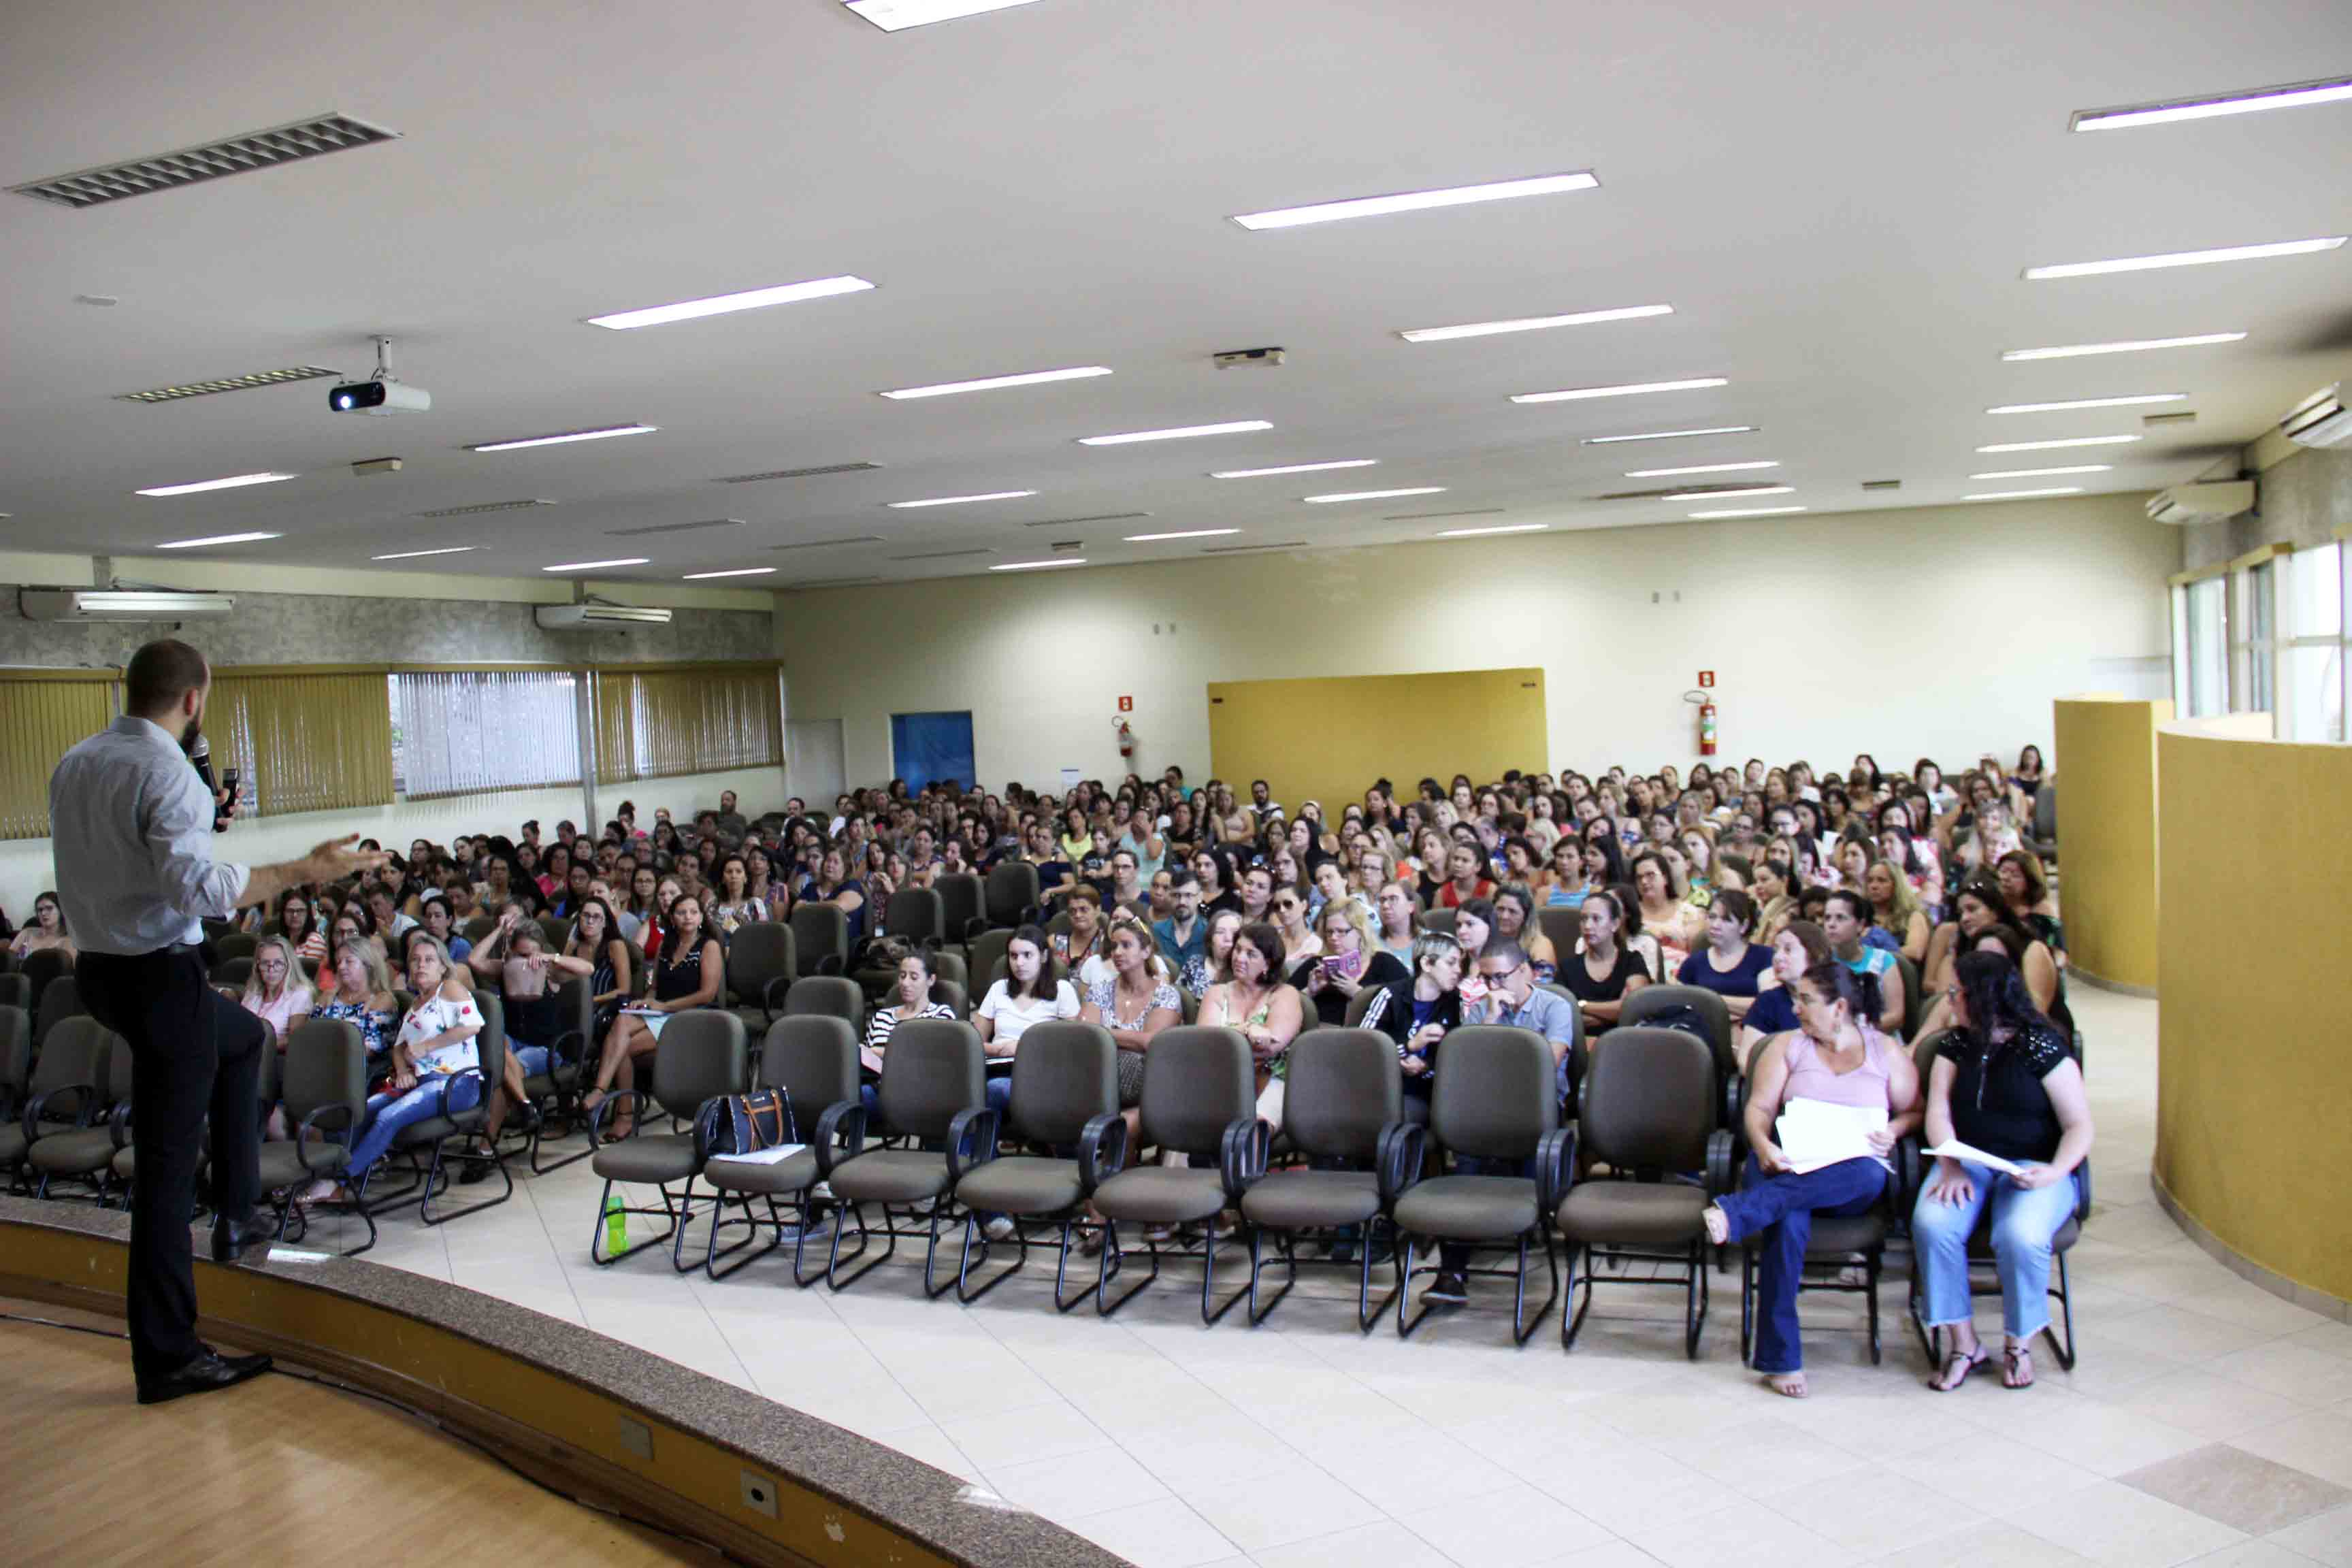 29.01.2019 Palestra Para Educadores com foco Jurídico e Comportamental Napa